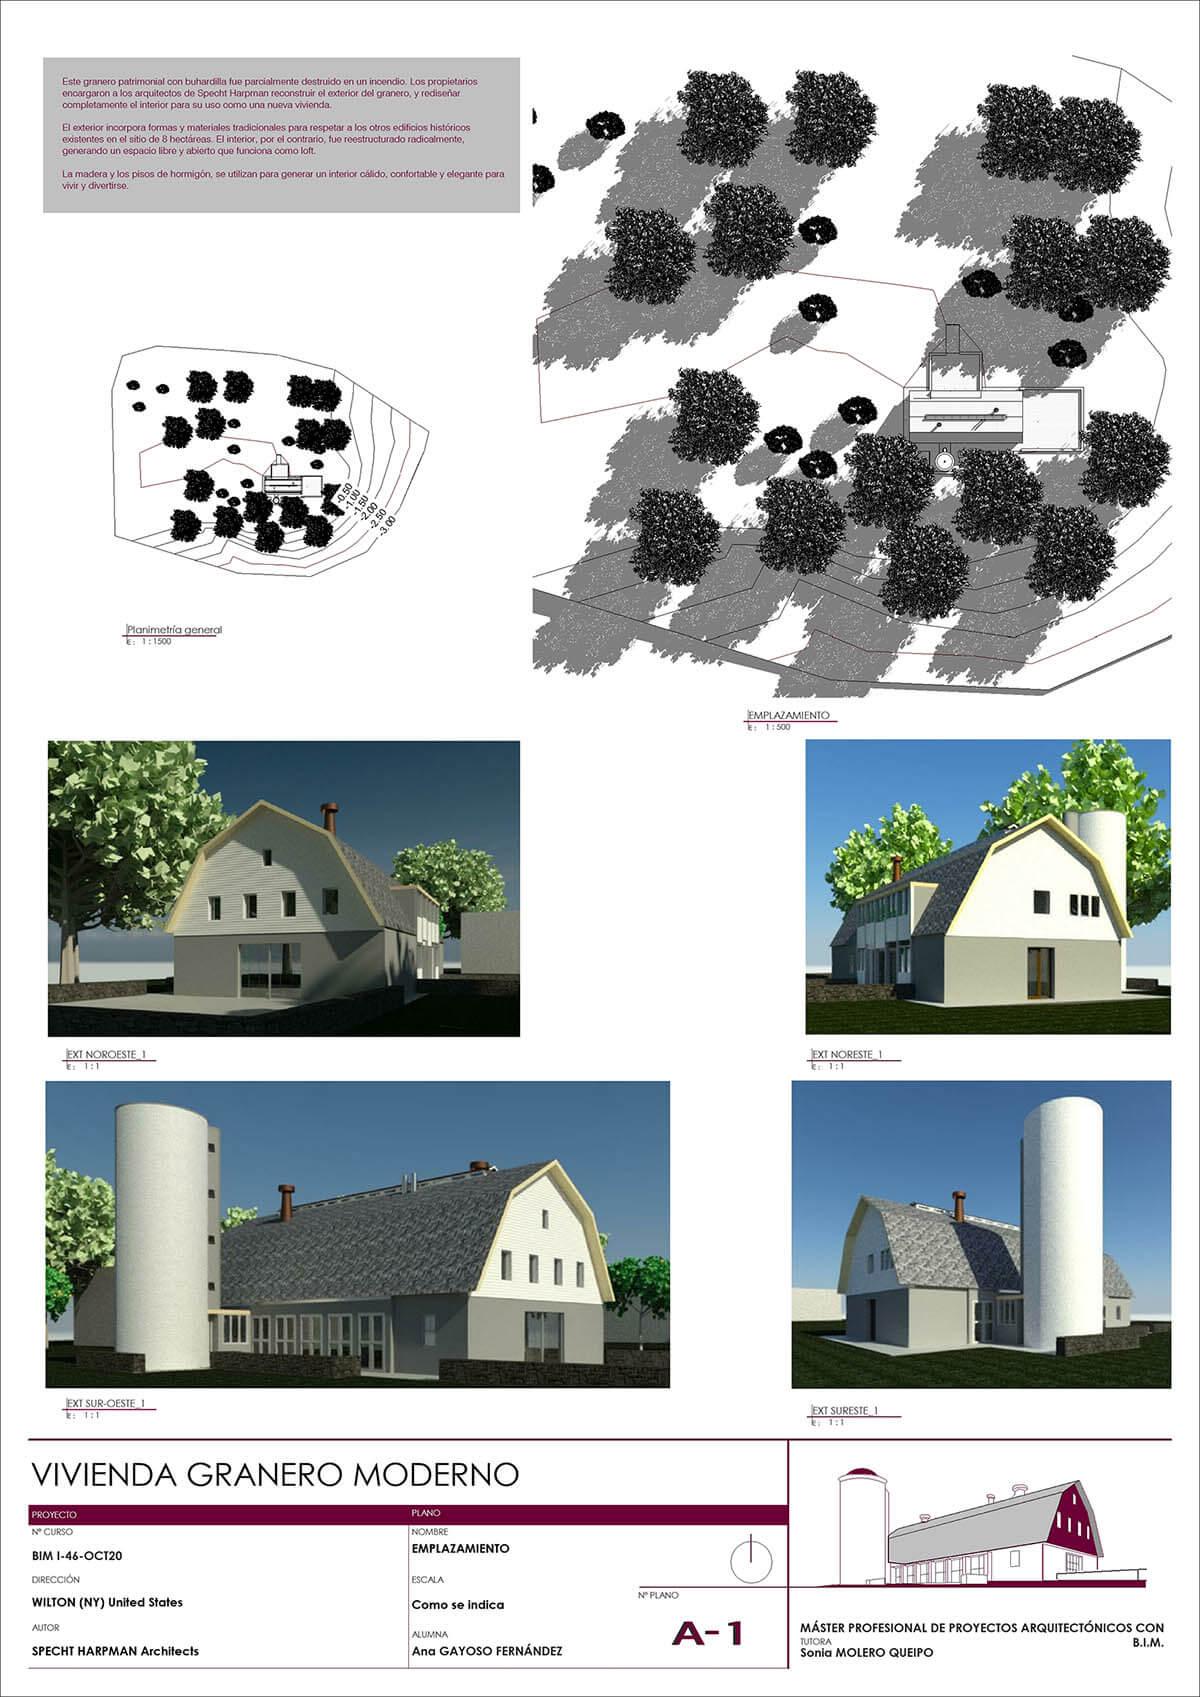 Plano de vistas 3D. Proyecto Revit